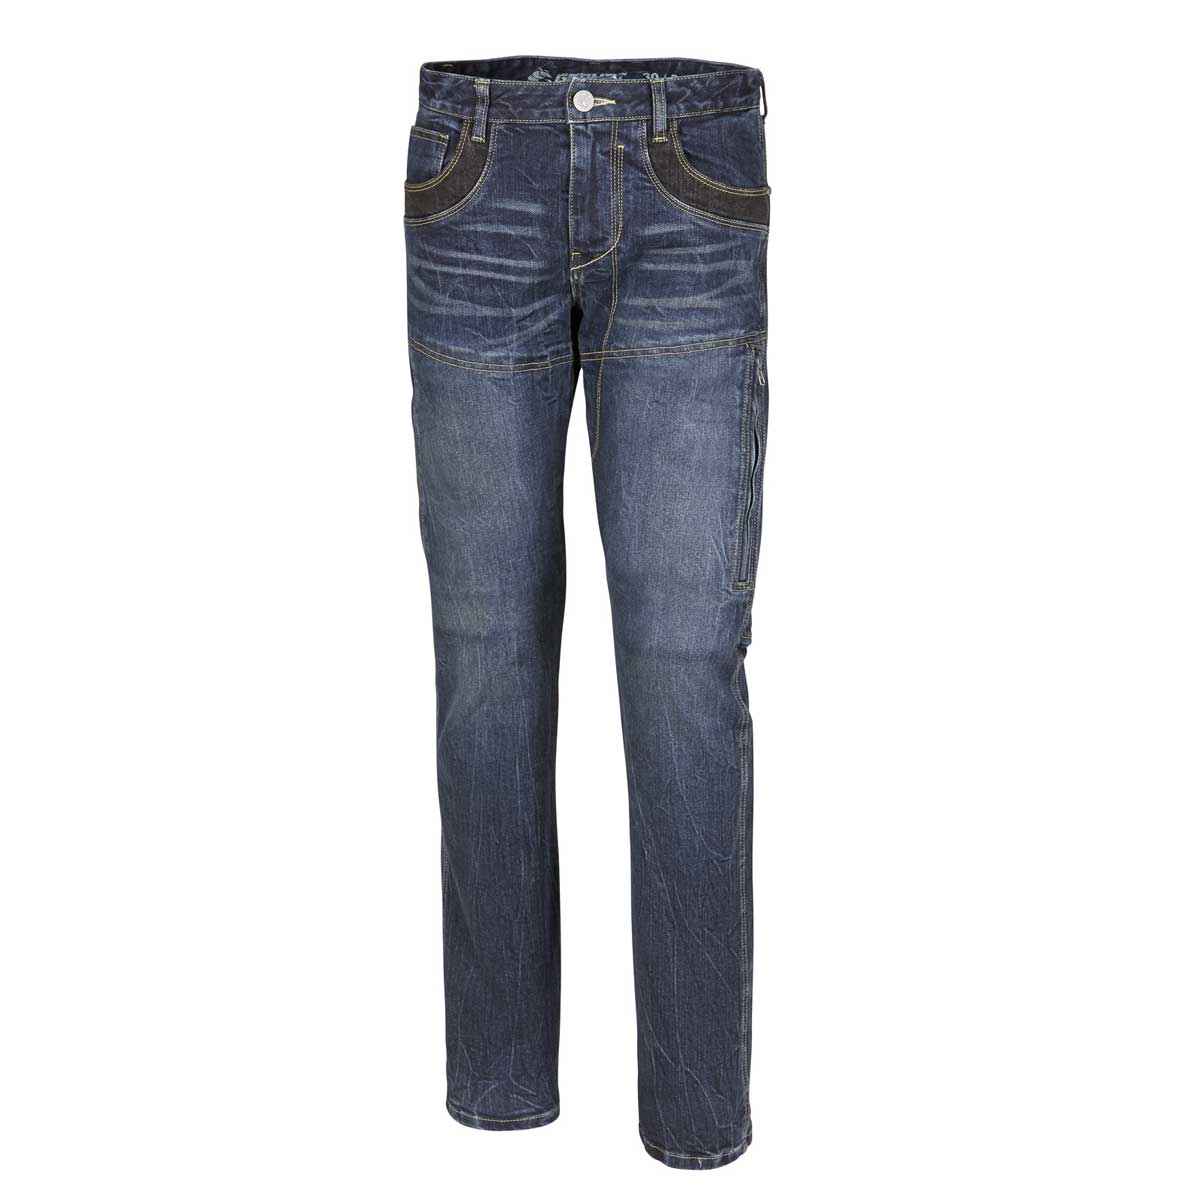 germot jump motorrad jeans herren lang blau cs bikewear. Black Bedroom Furniture Sets. Home Design Ideas